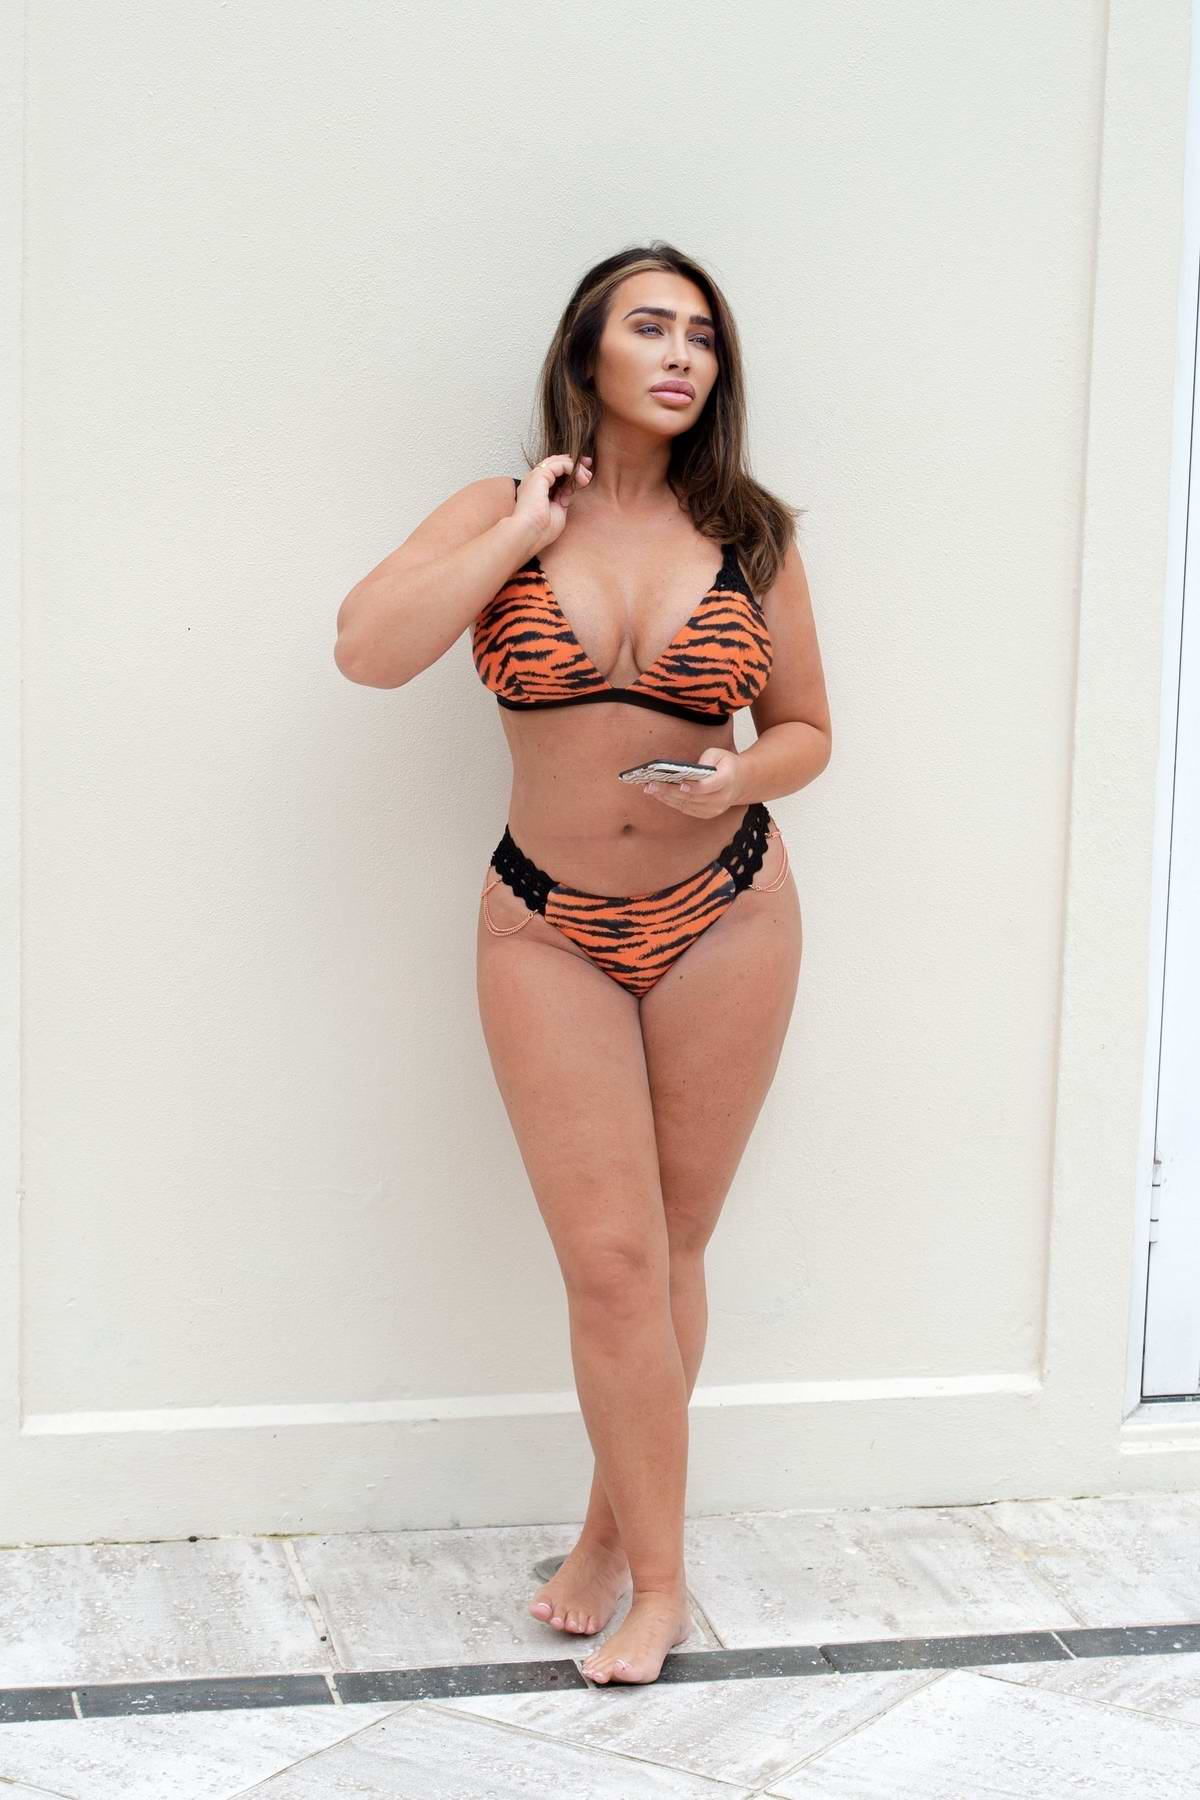 Lauren Goodger poses in an animal print bikini during a photoshoot in London, UK